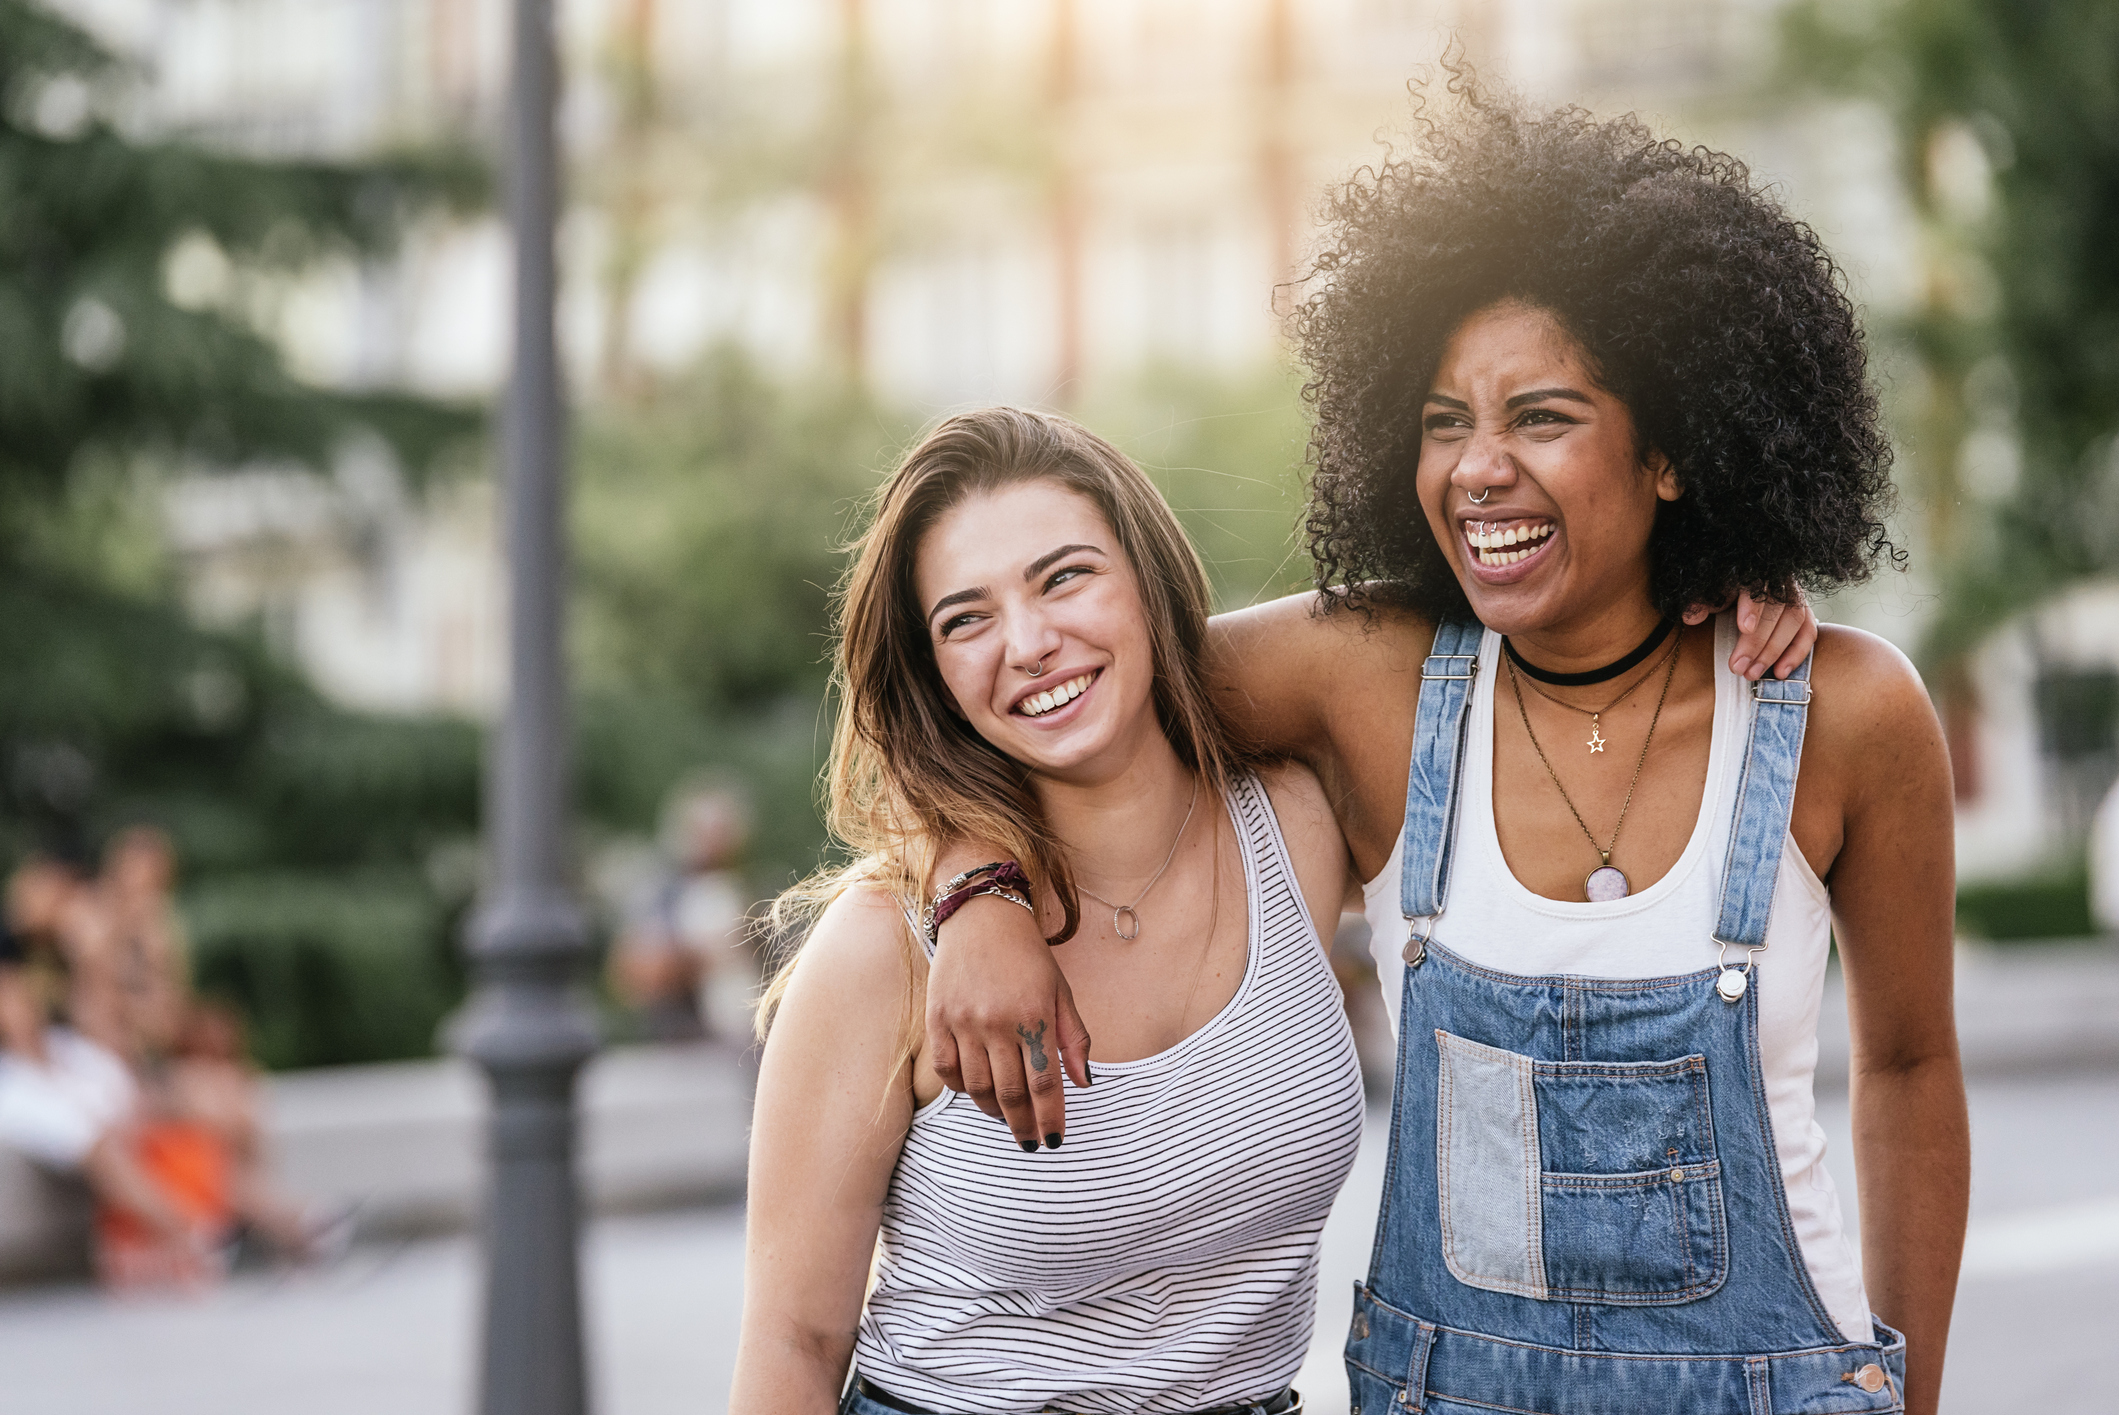 Beautiful women having fun in the street. Youth concept.